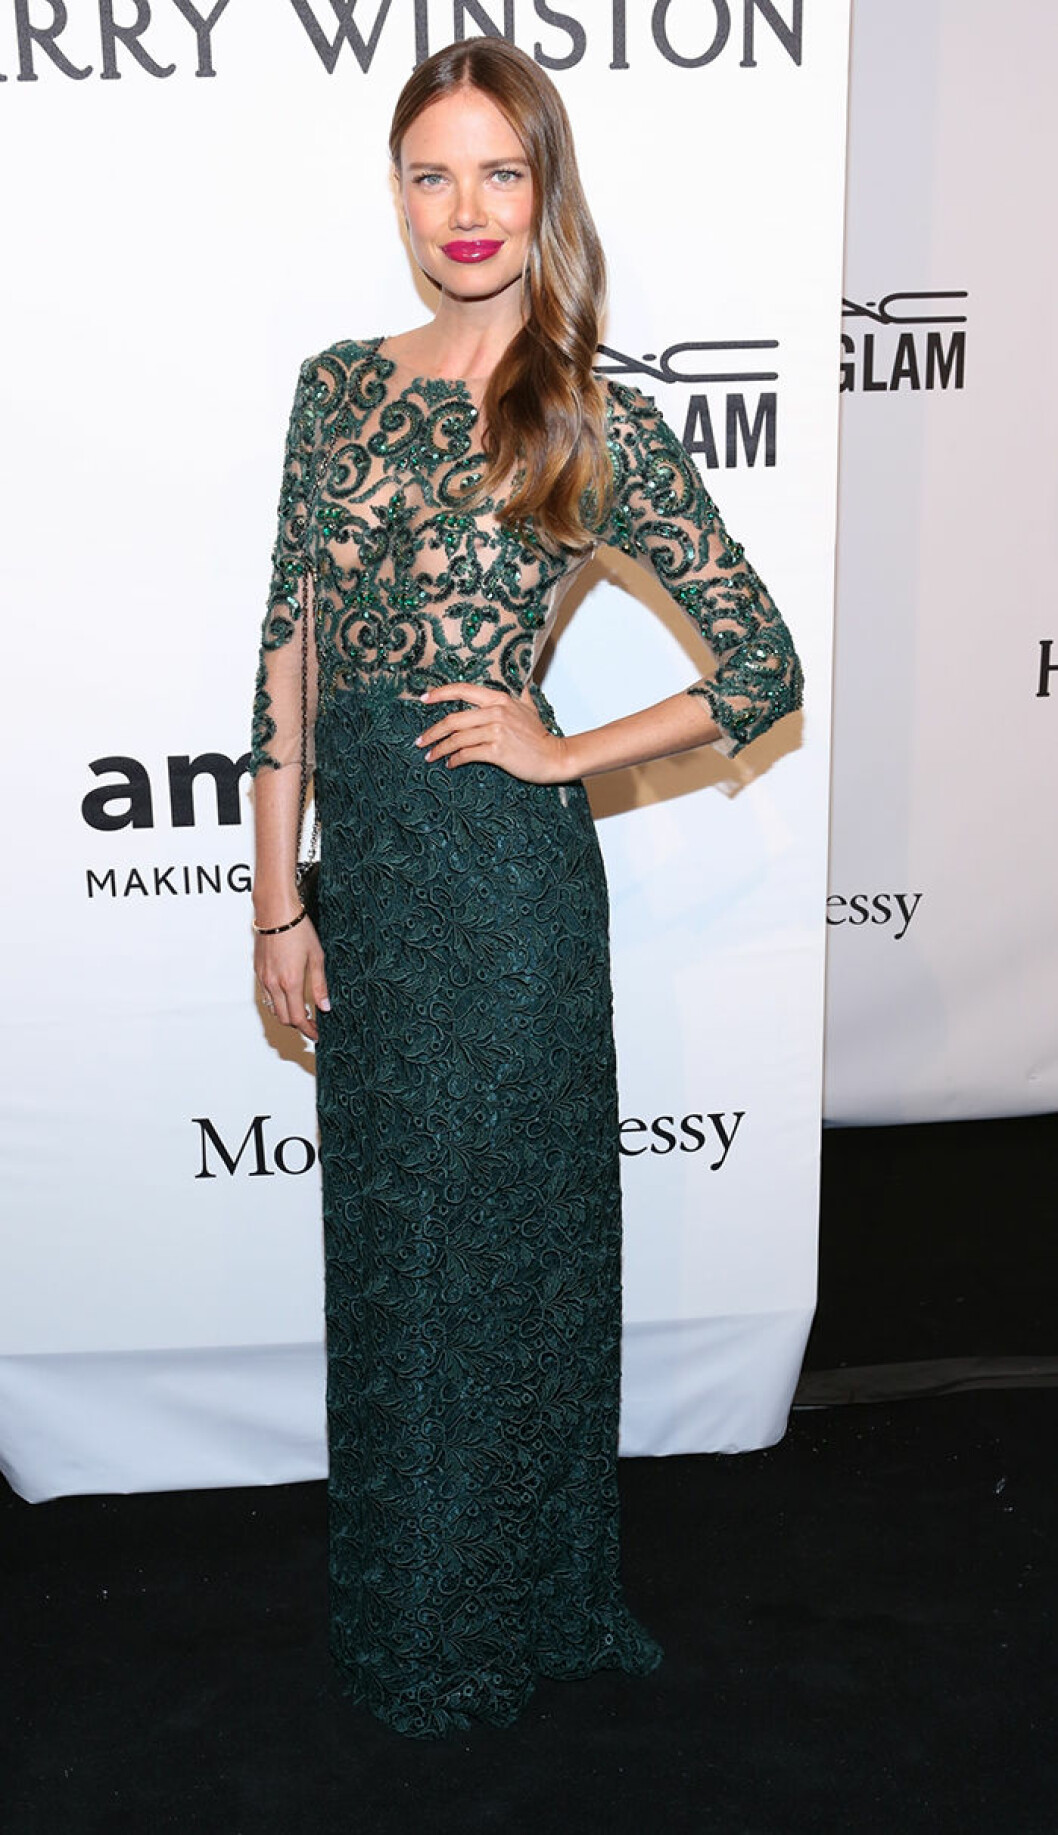 Alicia Rountree seen attending the 2015 amfAR New York Gala at Cipriani Wall Street